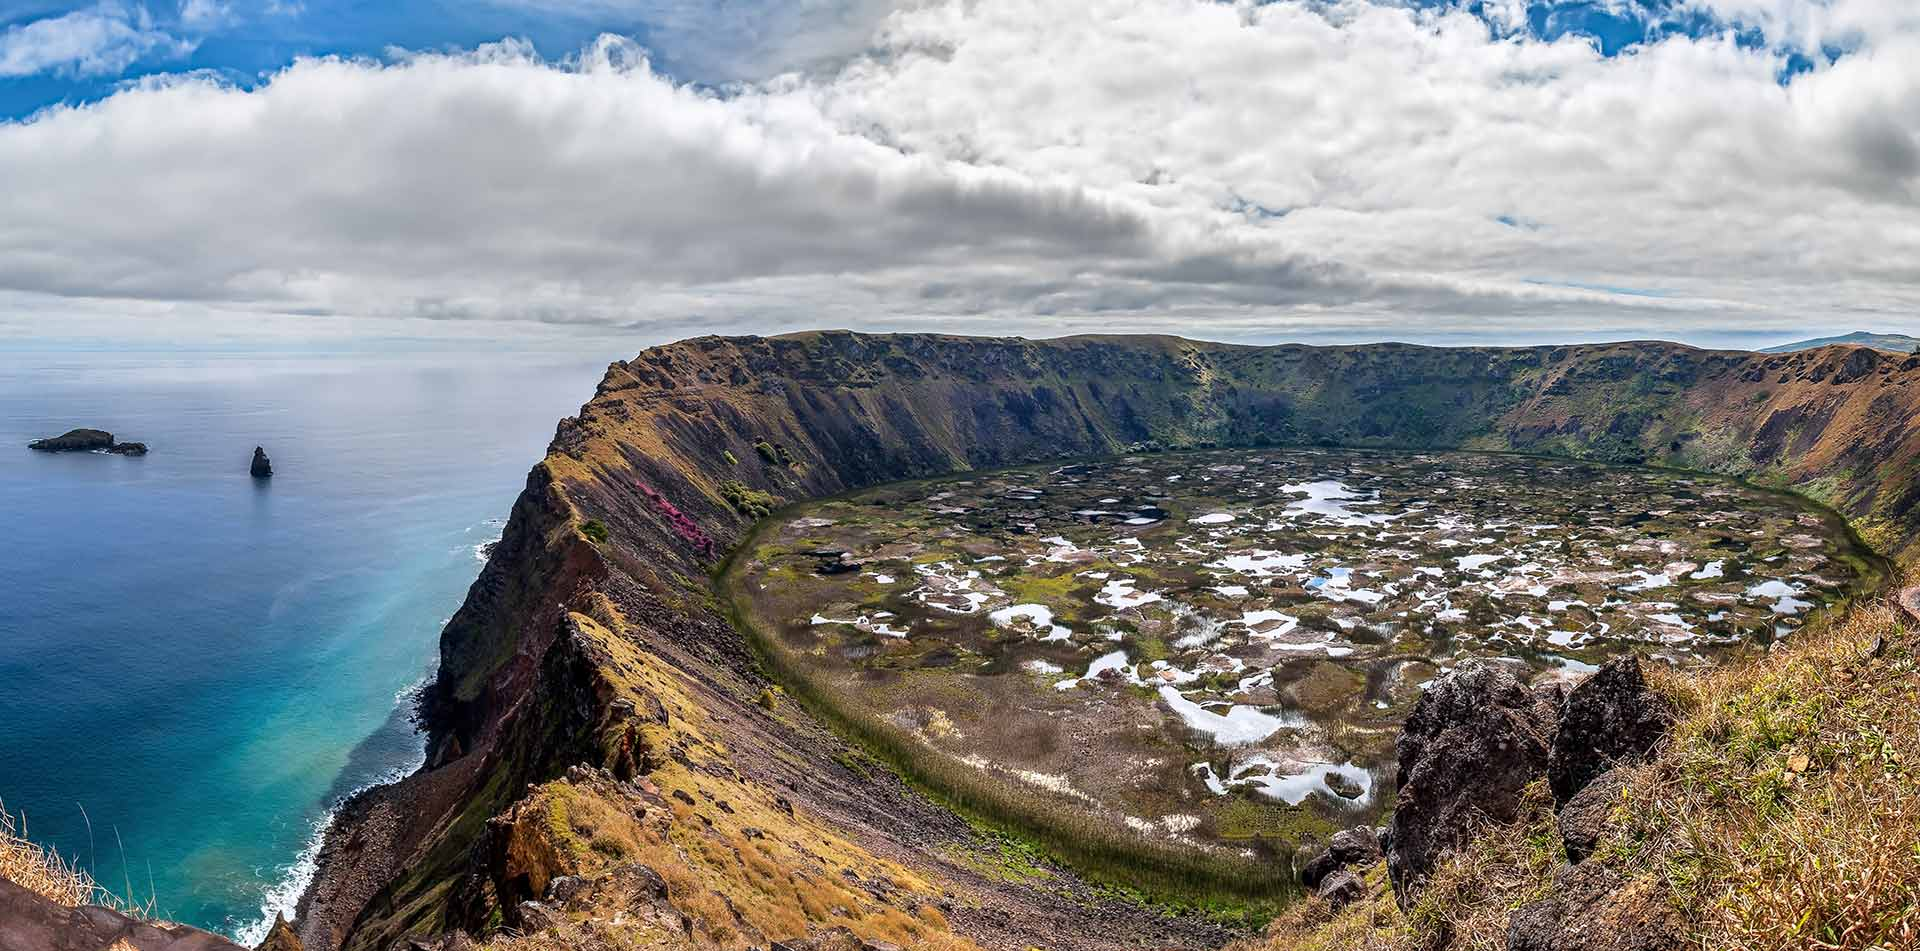 Coastline and Crater of Rano Kau, Easter Island, Chile